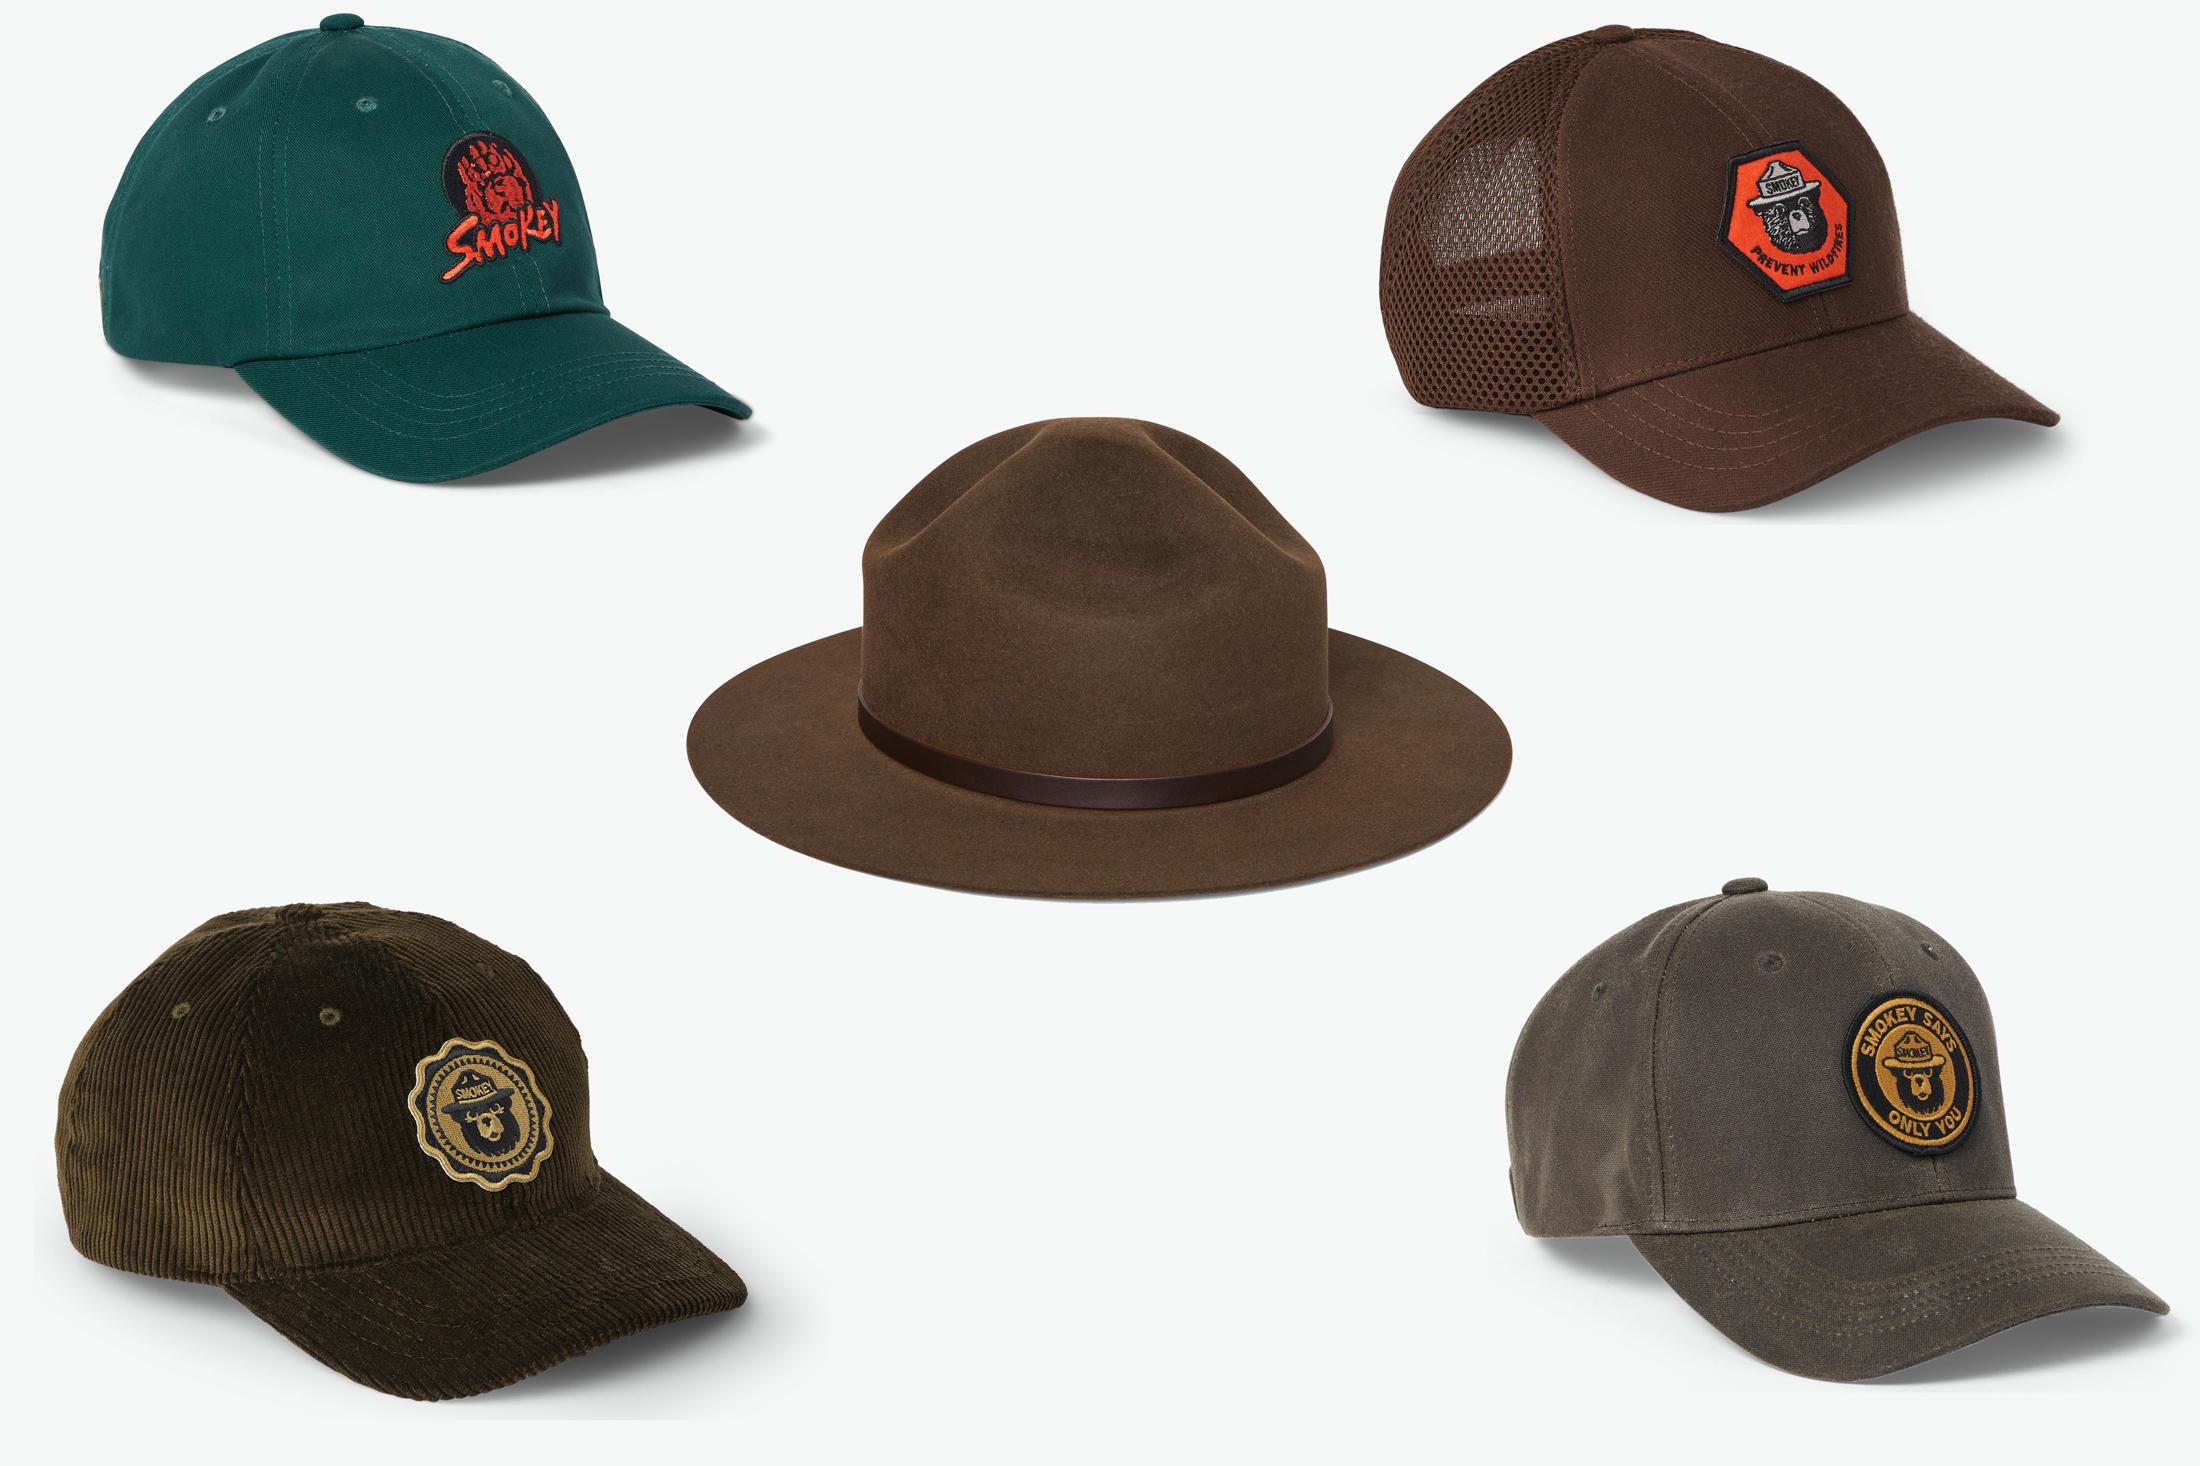 Filson x Smokey the Bear hats